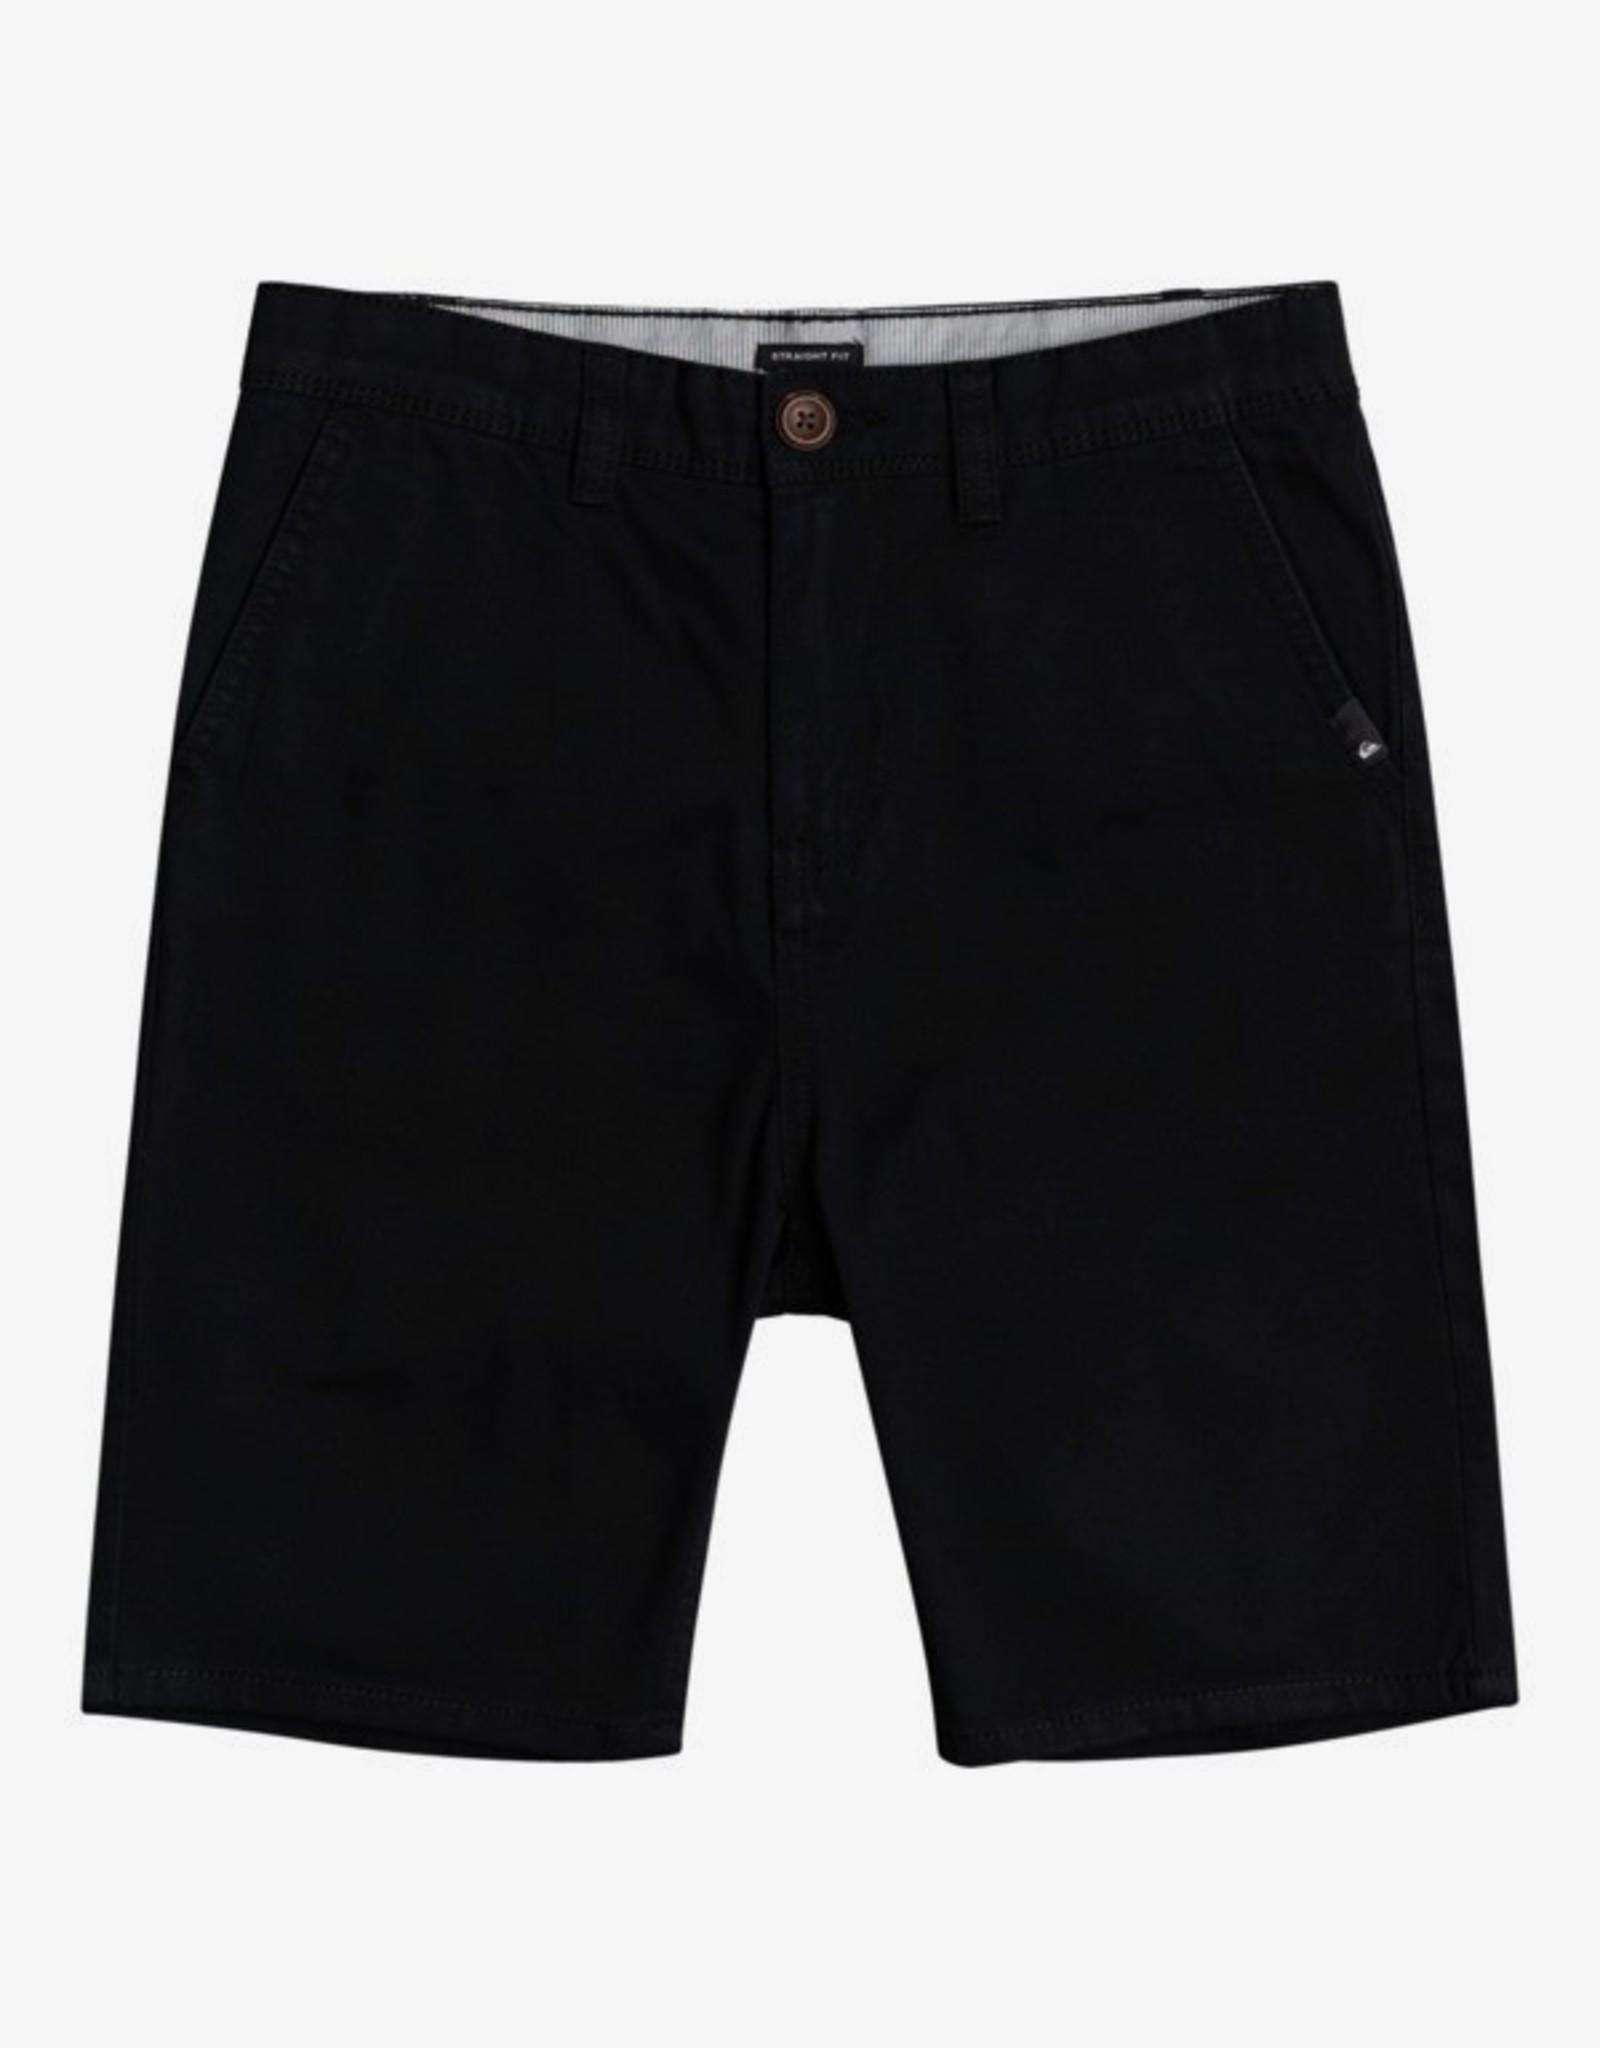 Quiksilver SP21 B Everyday Chino Yth Shorts